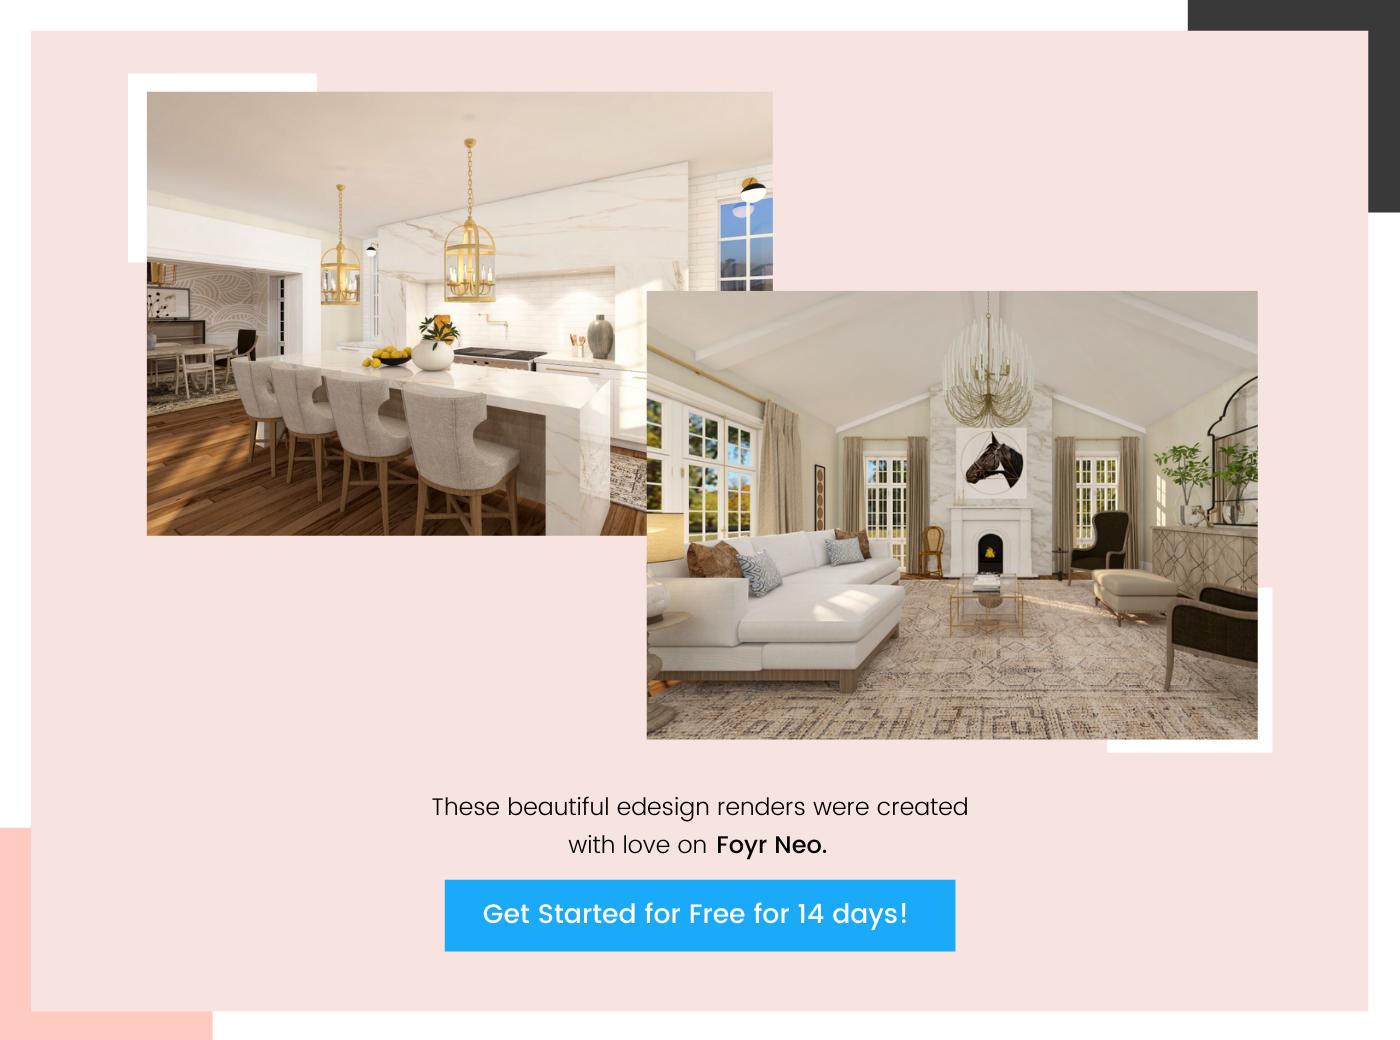 create e-design renders on Foyr Neo 5